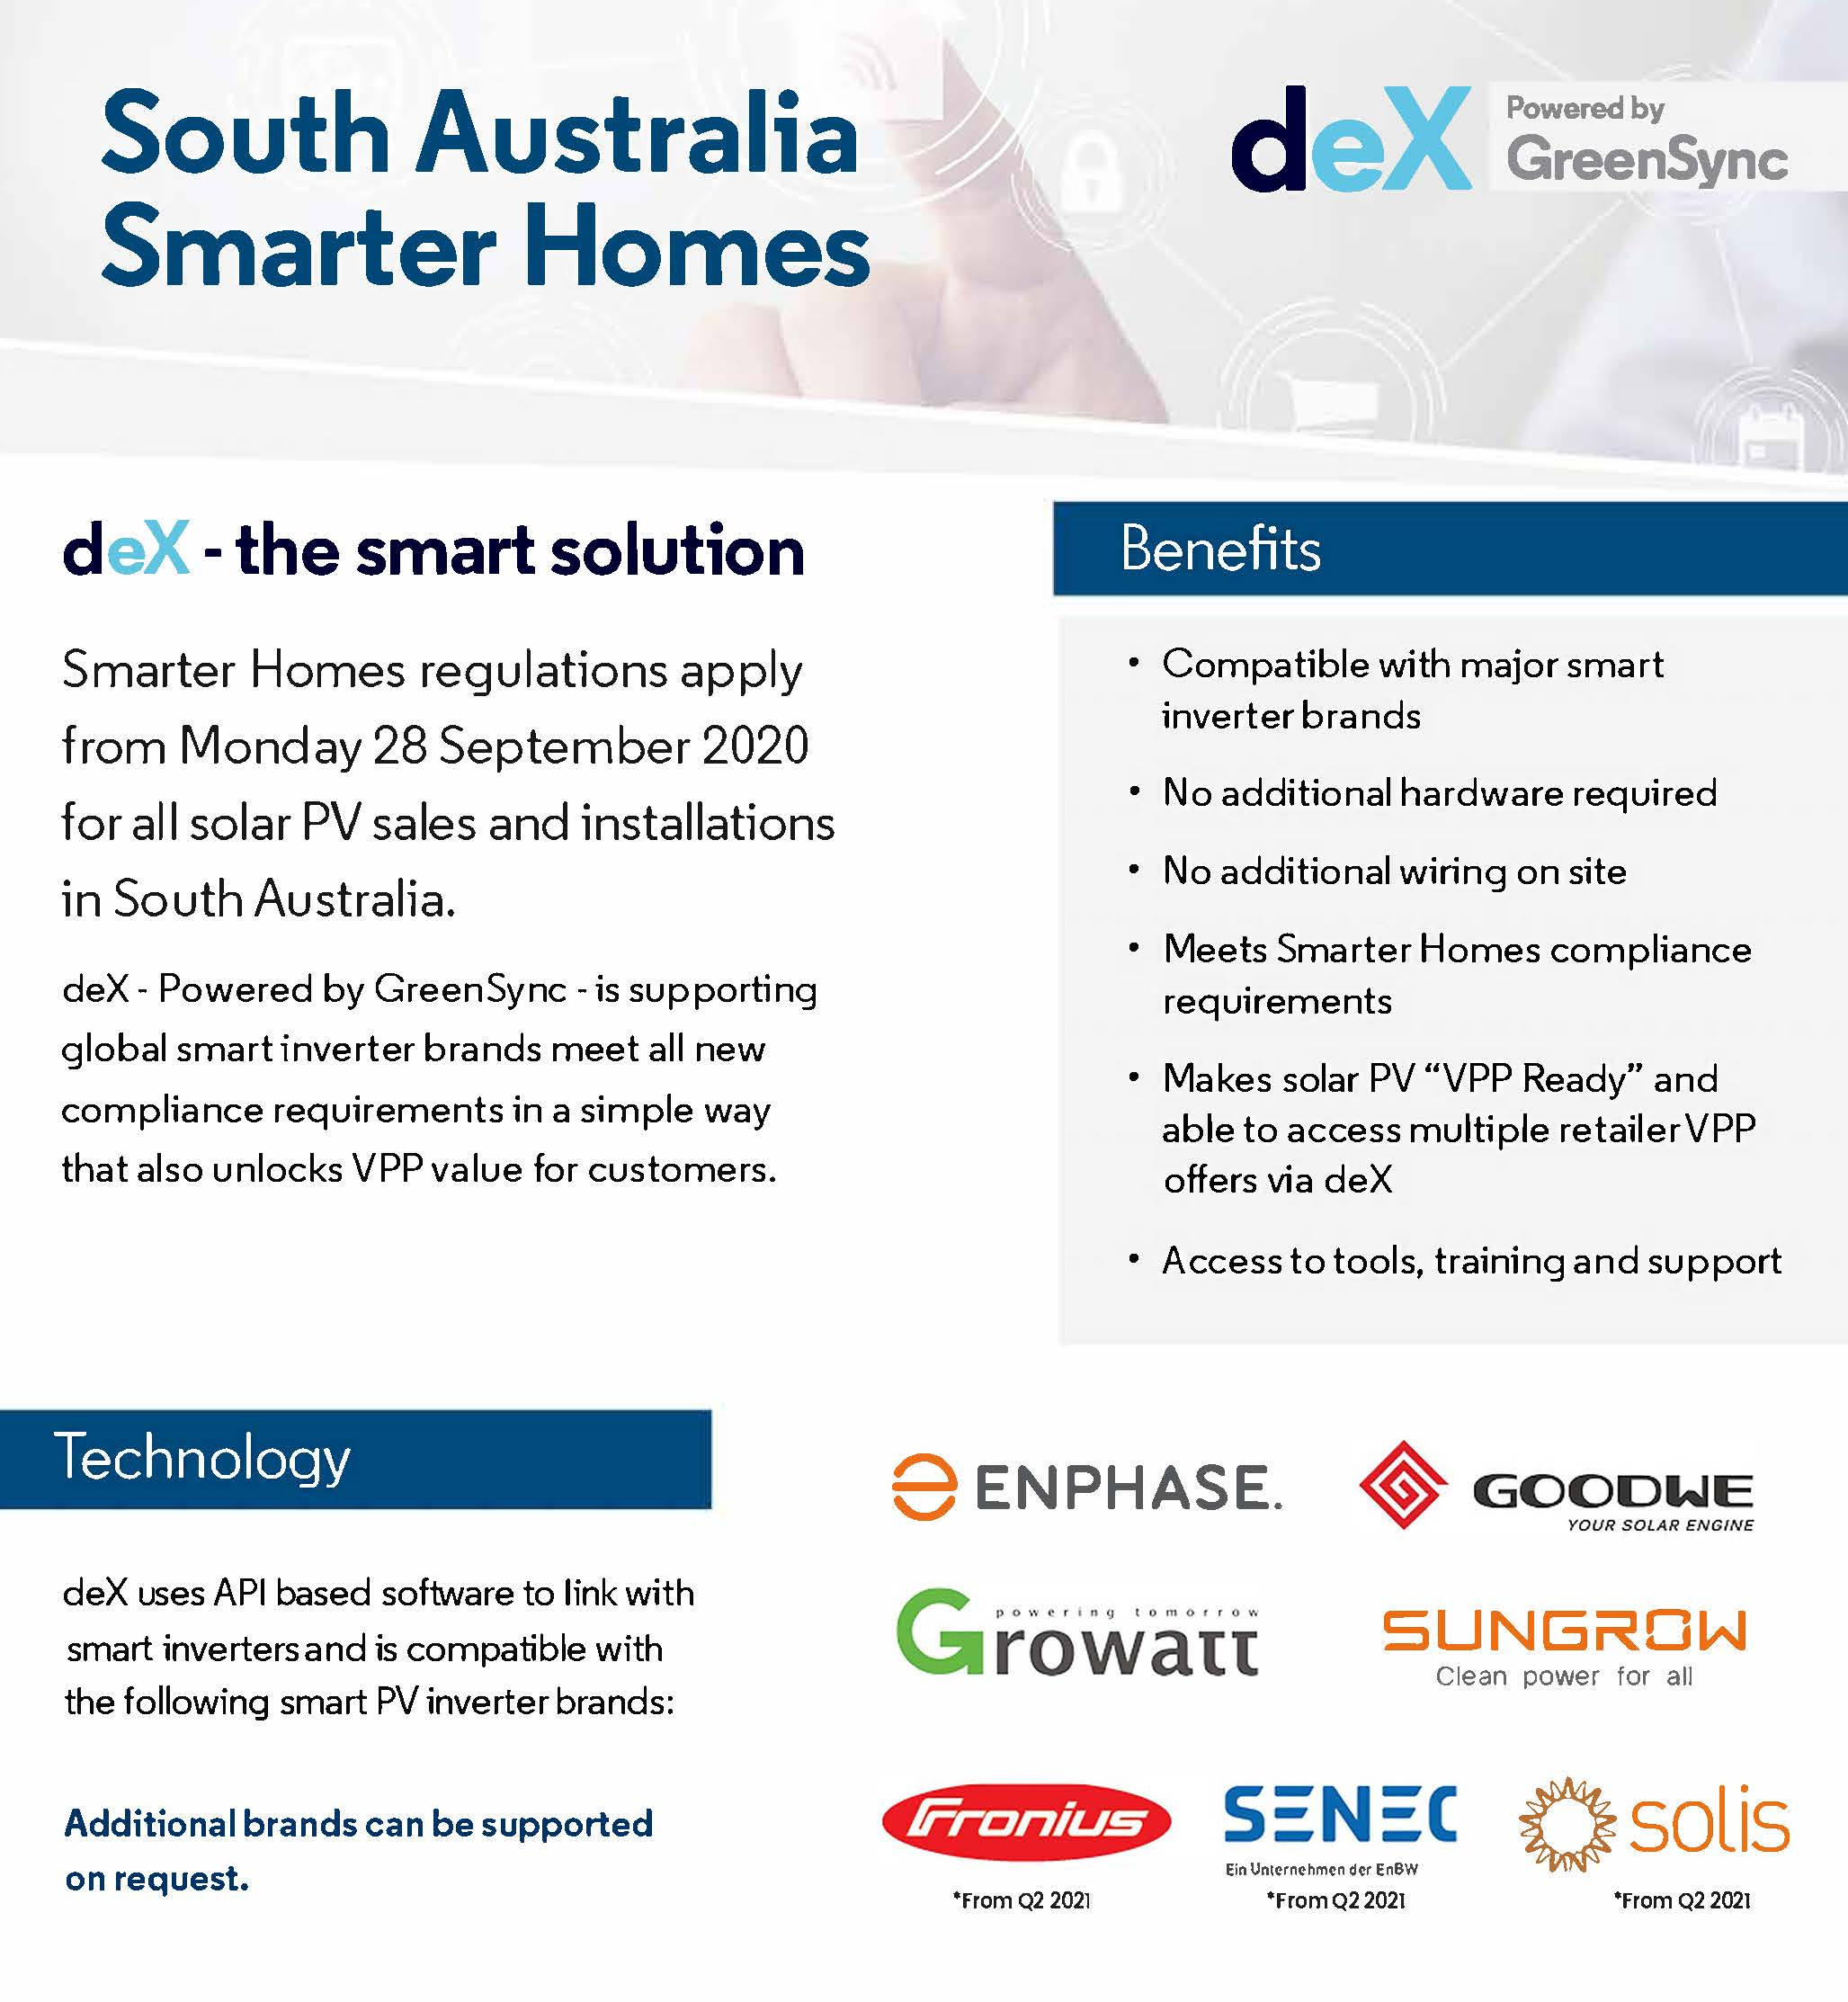 deX_SA_Smarter_Homes_fact_sheet_v3